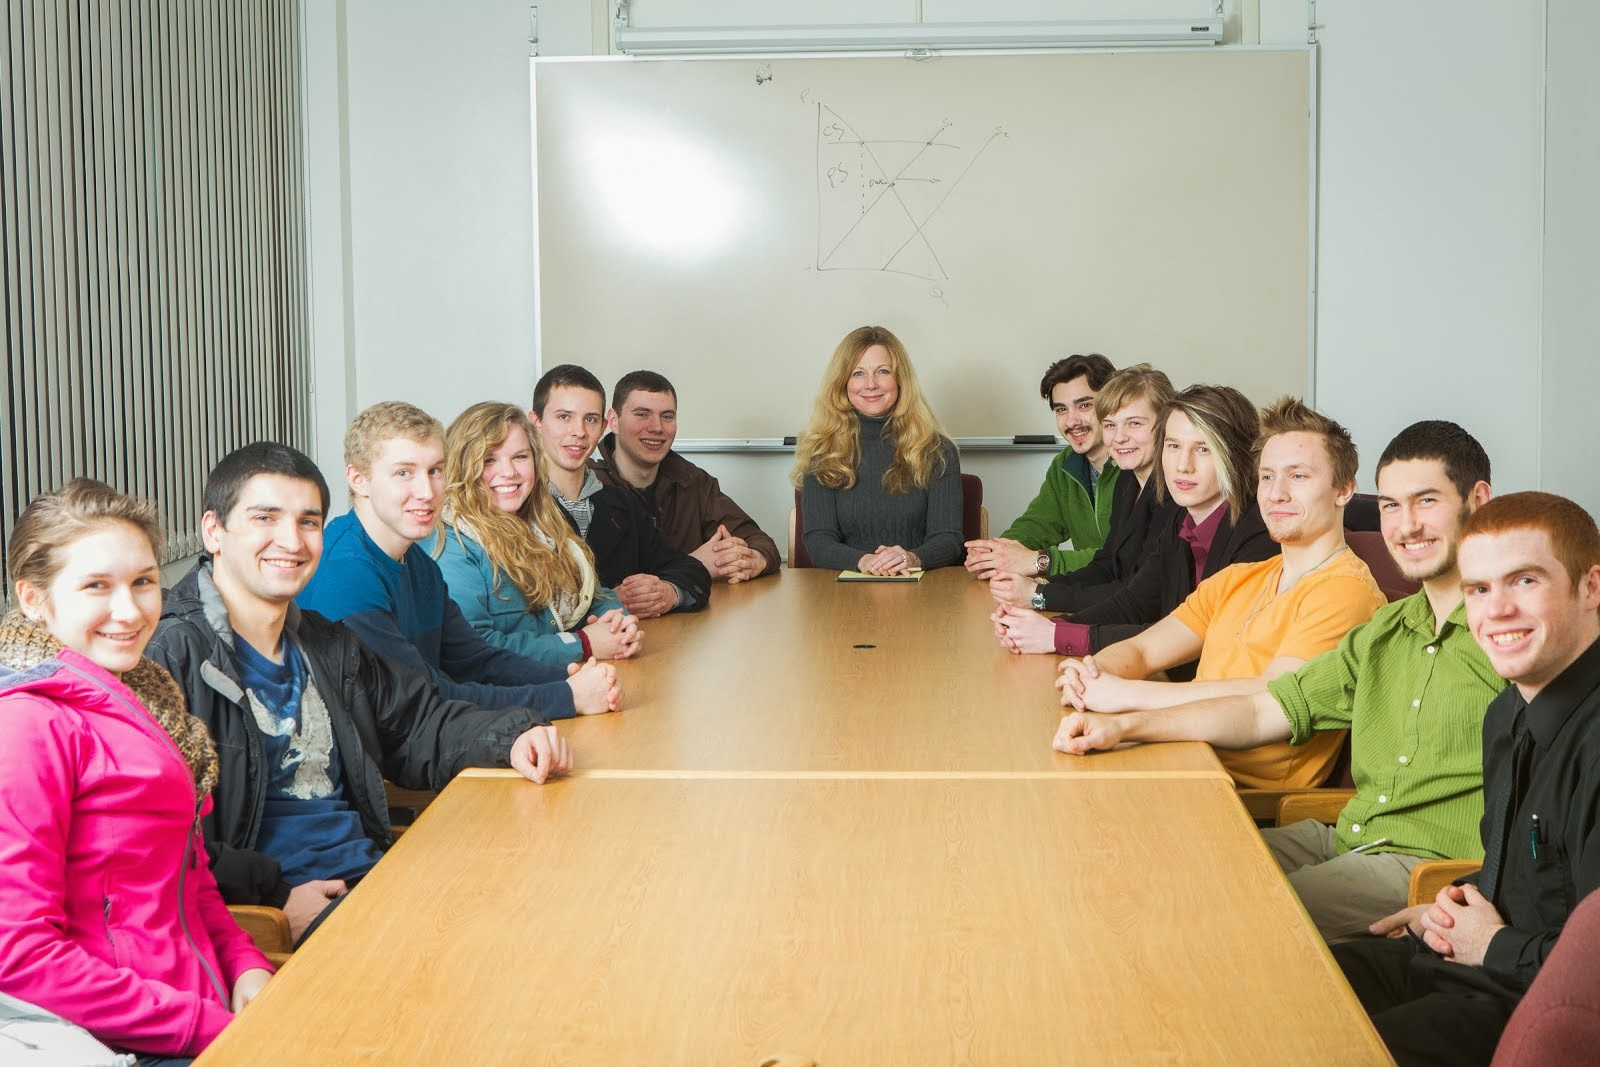 Fall 2013's Scholars